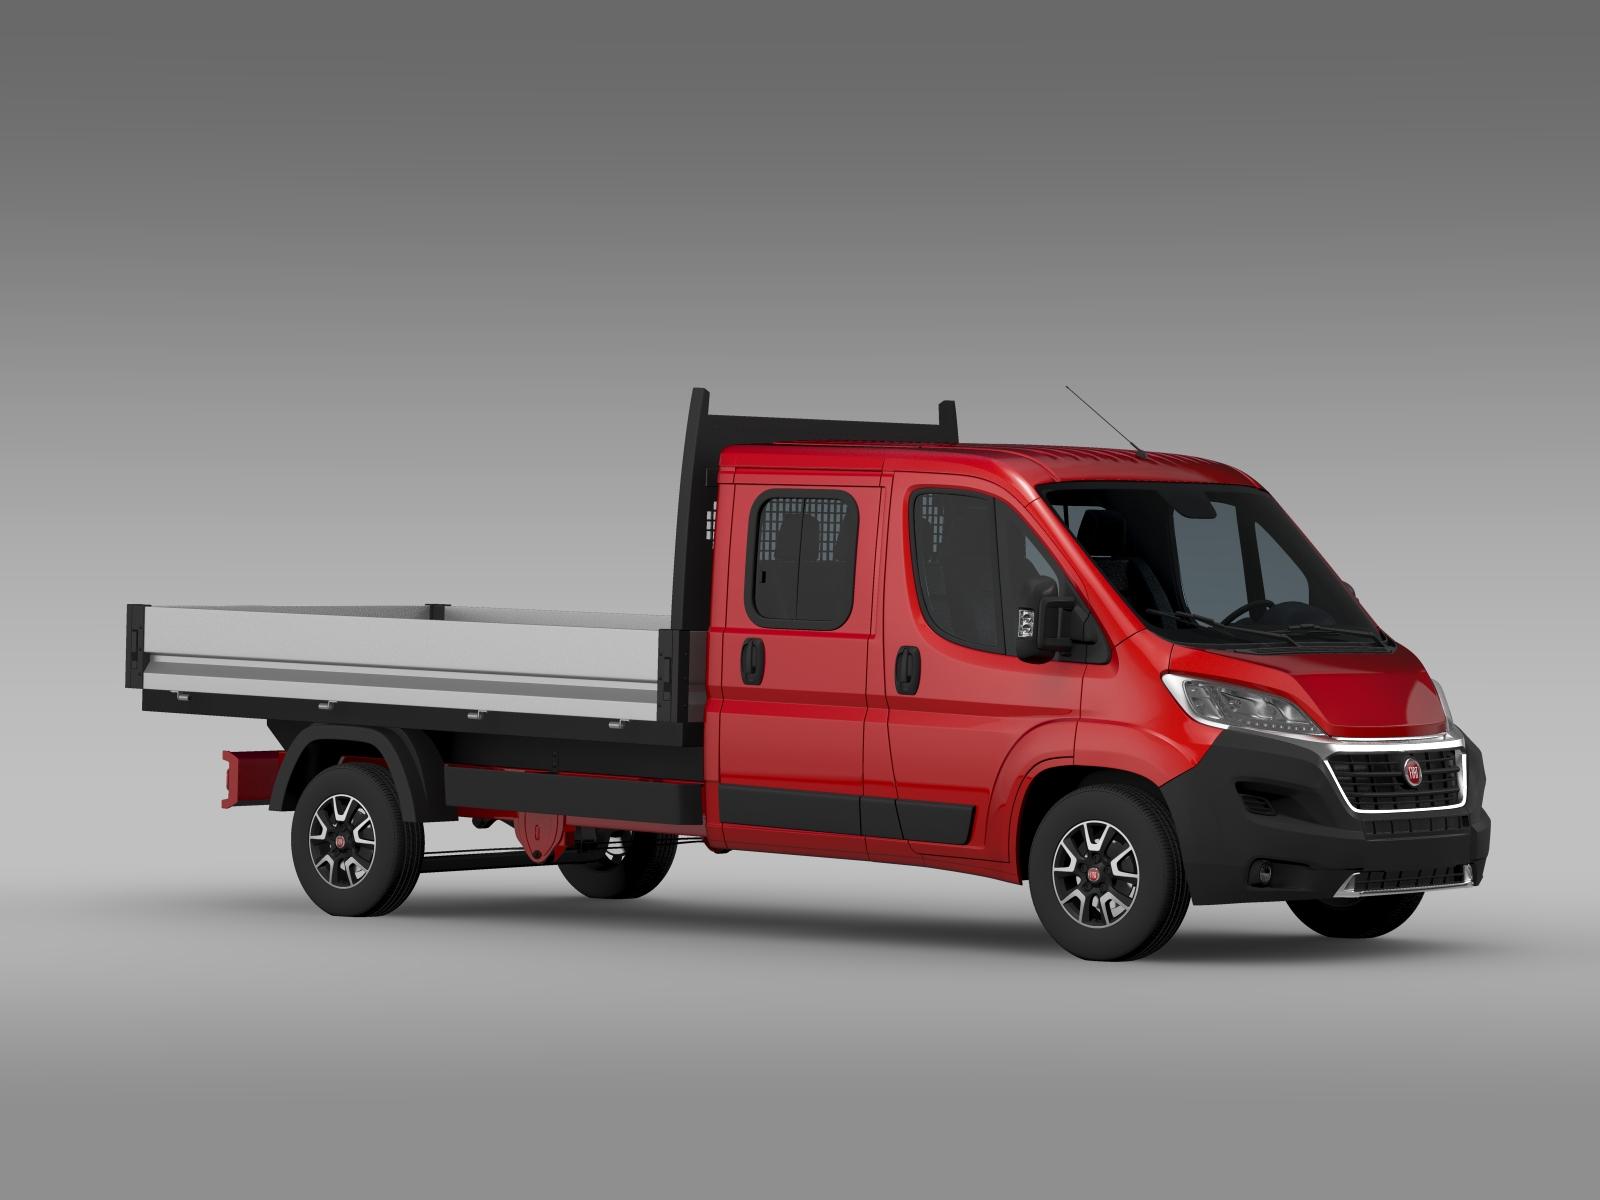 fiat ducato crew cab truck 2016 3d model buy fiat ducato. Black Bedroom Furniture Sets. Home Design Ideas